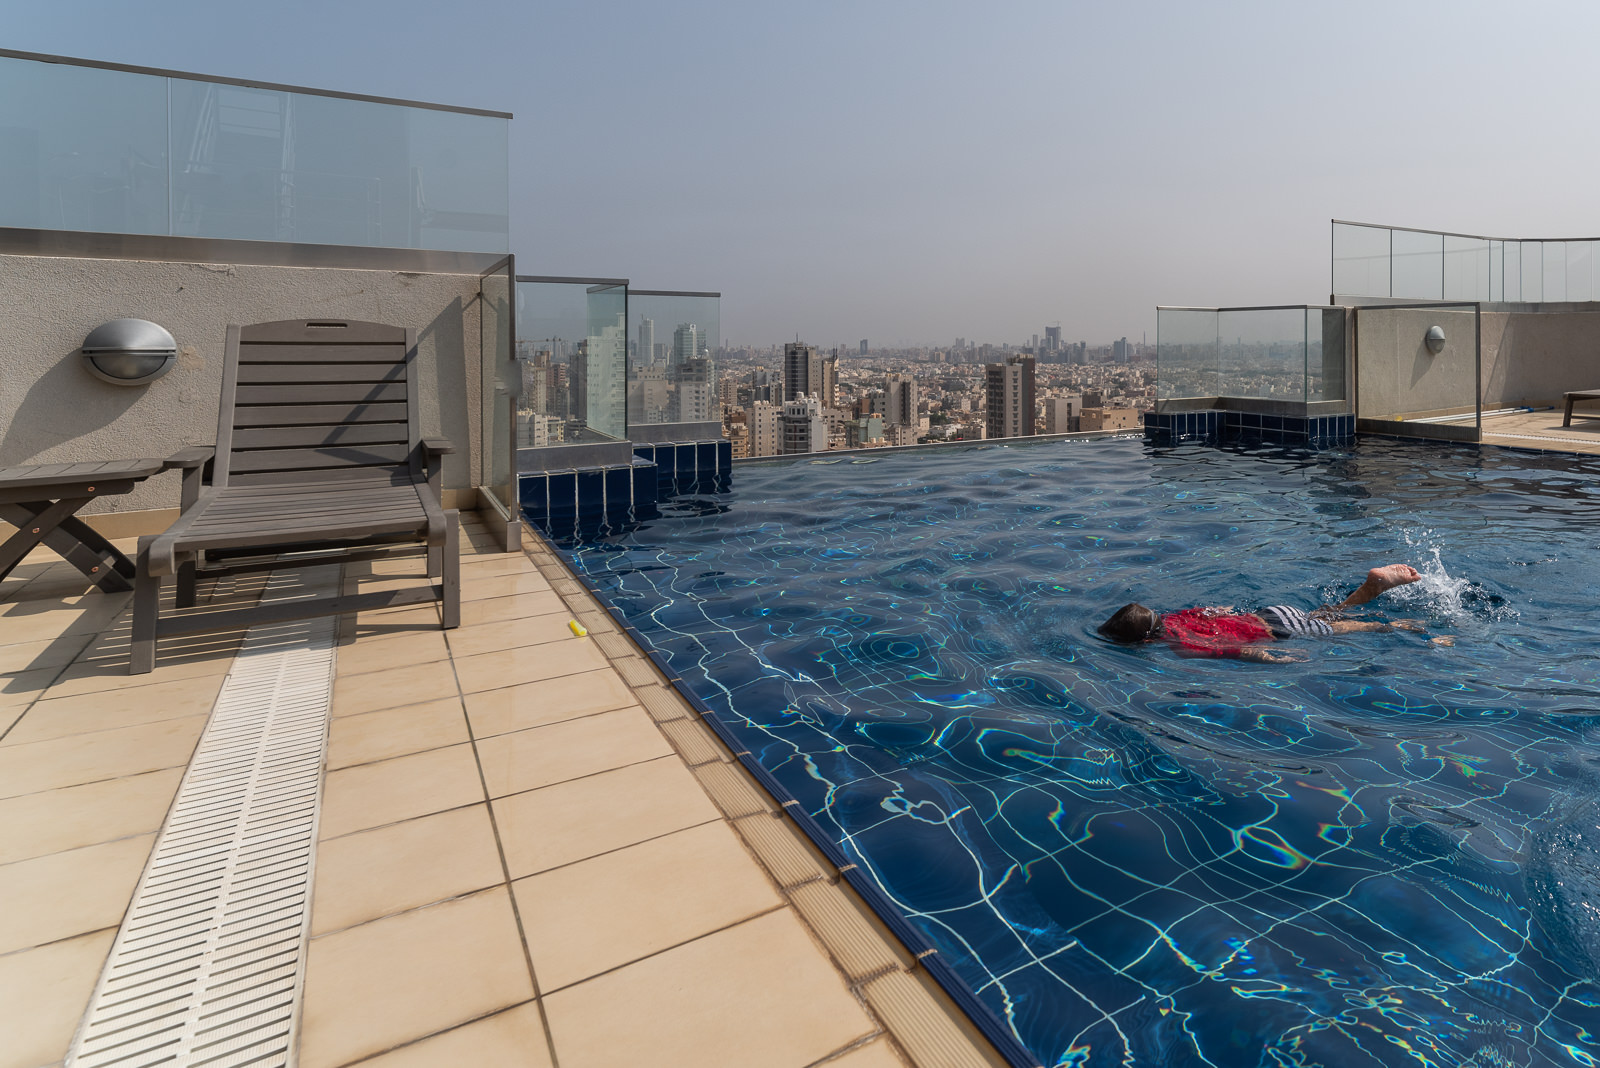 Bneid Al Gar – unfurnished, two bedroom apartments w/facilities